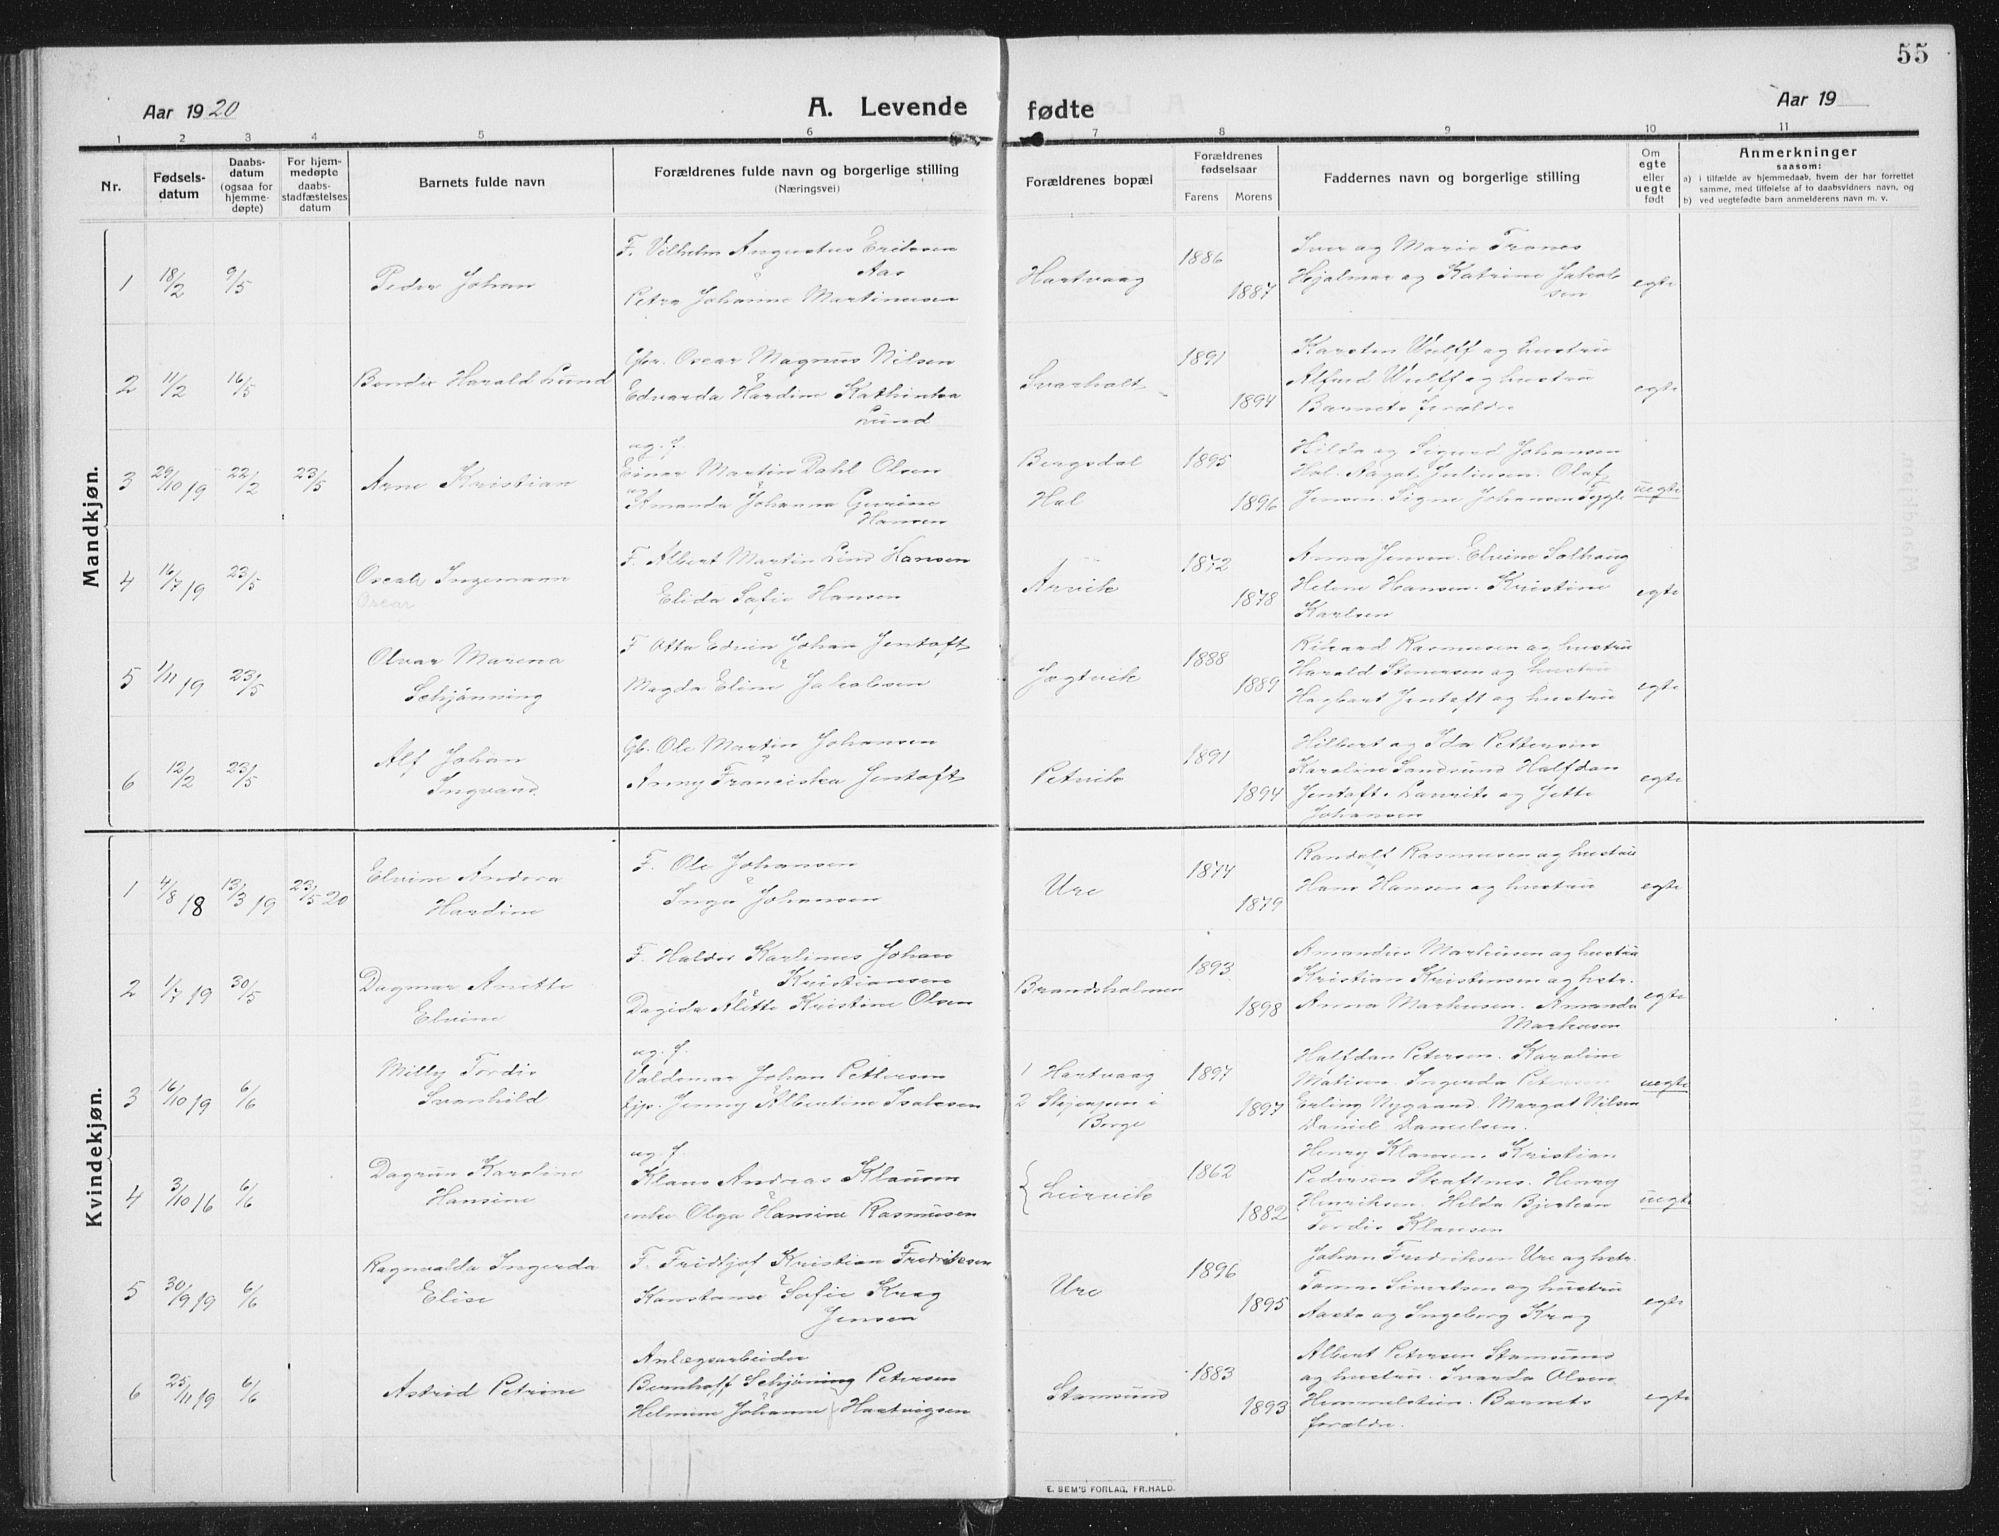 SAT, Ministerialprotokoller, klokkerbøker og fødselsregistre - Nordland, 882/L1183: Klokkerbok nr. 882C01, 1911-1938, s. 55